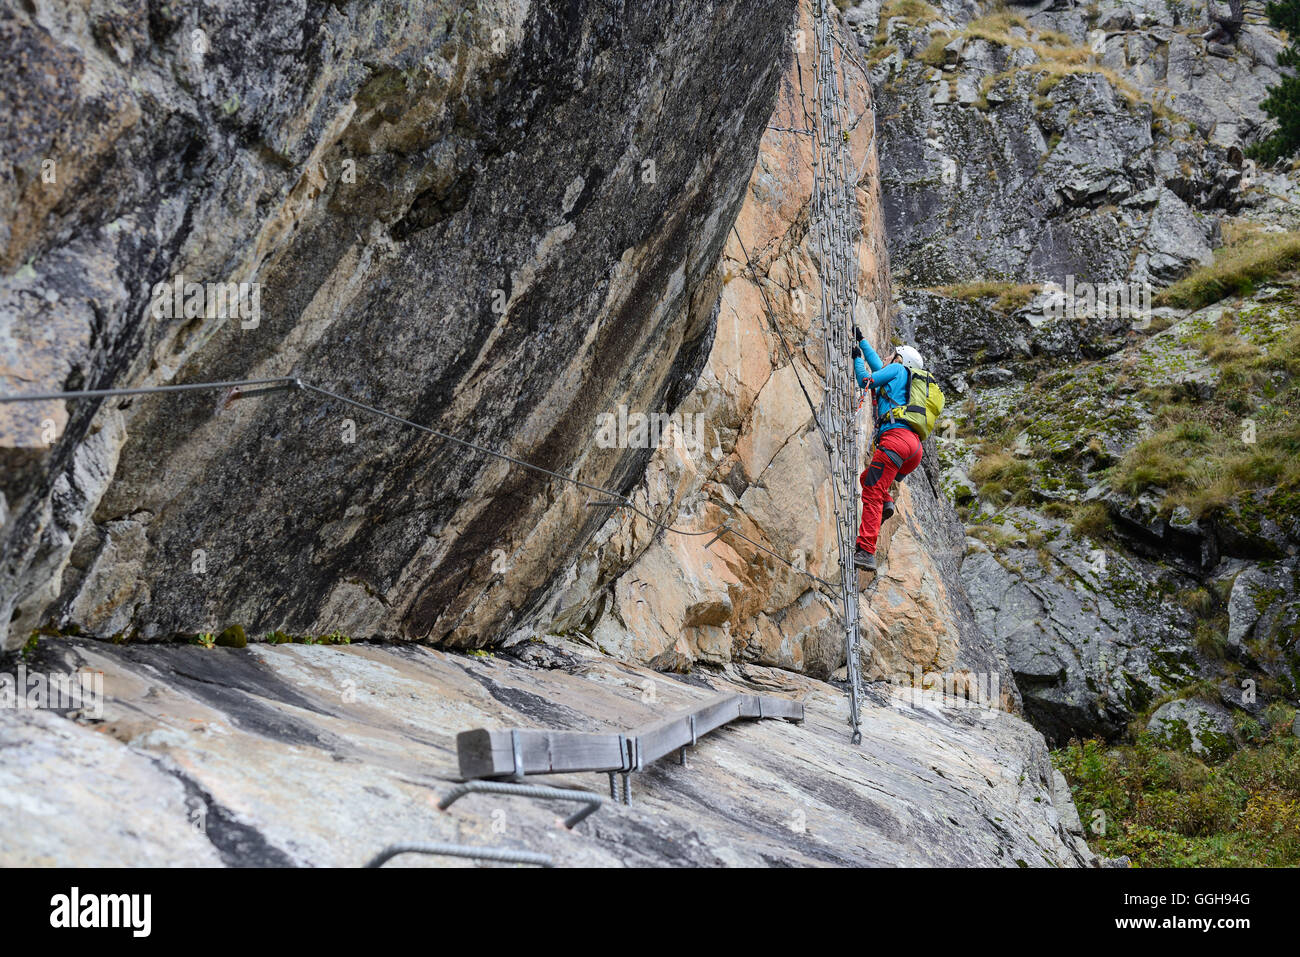 Klettersteig La Resgia : Frau klettern den klettersteig la resgia engadin graubünden